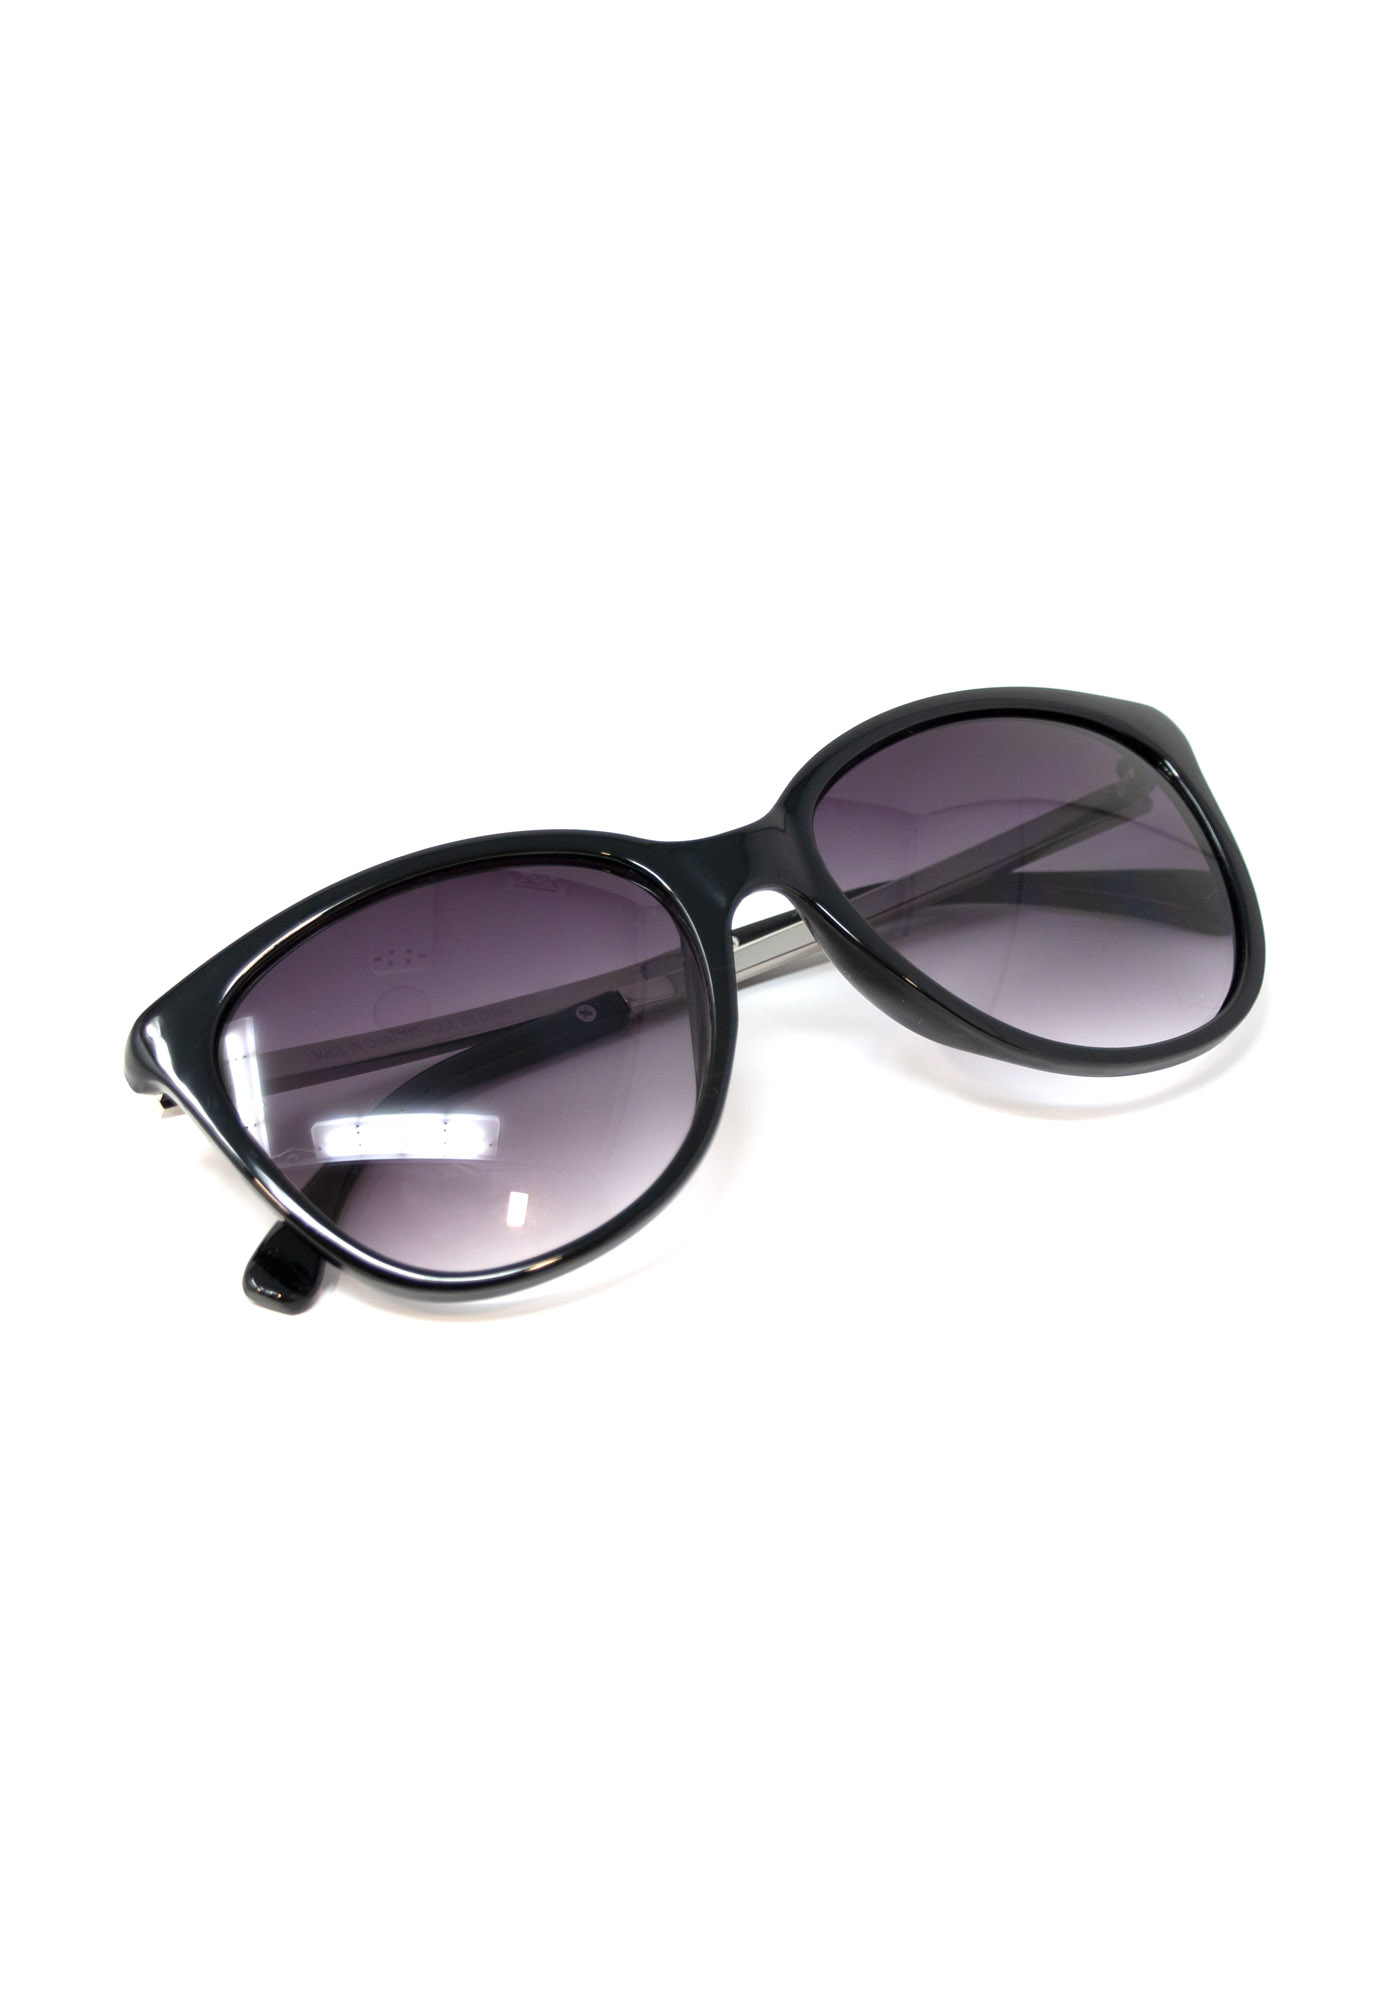 26c34bb4b7d7 Women's Subtle Cat Eye Sunglasses | Warehouse One